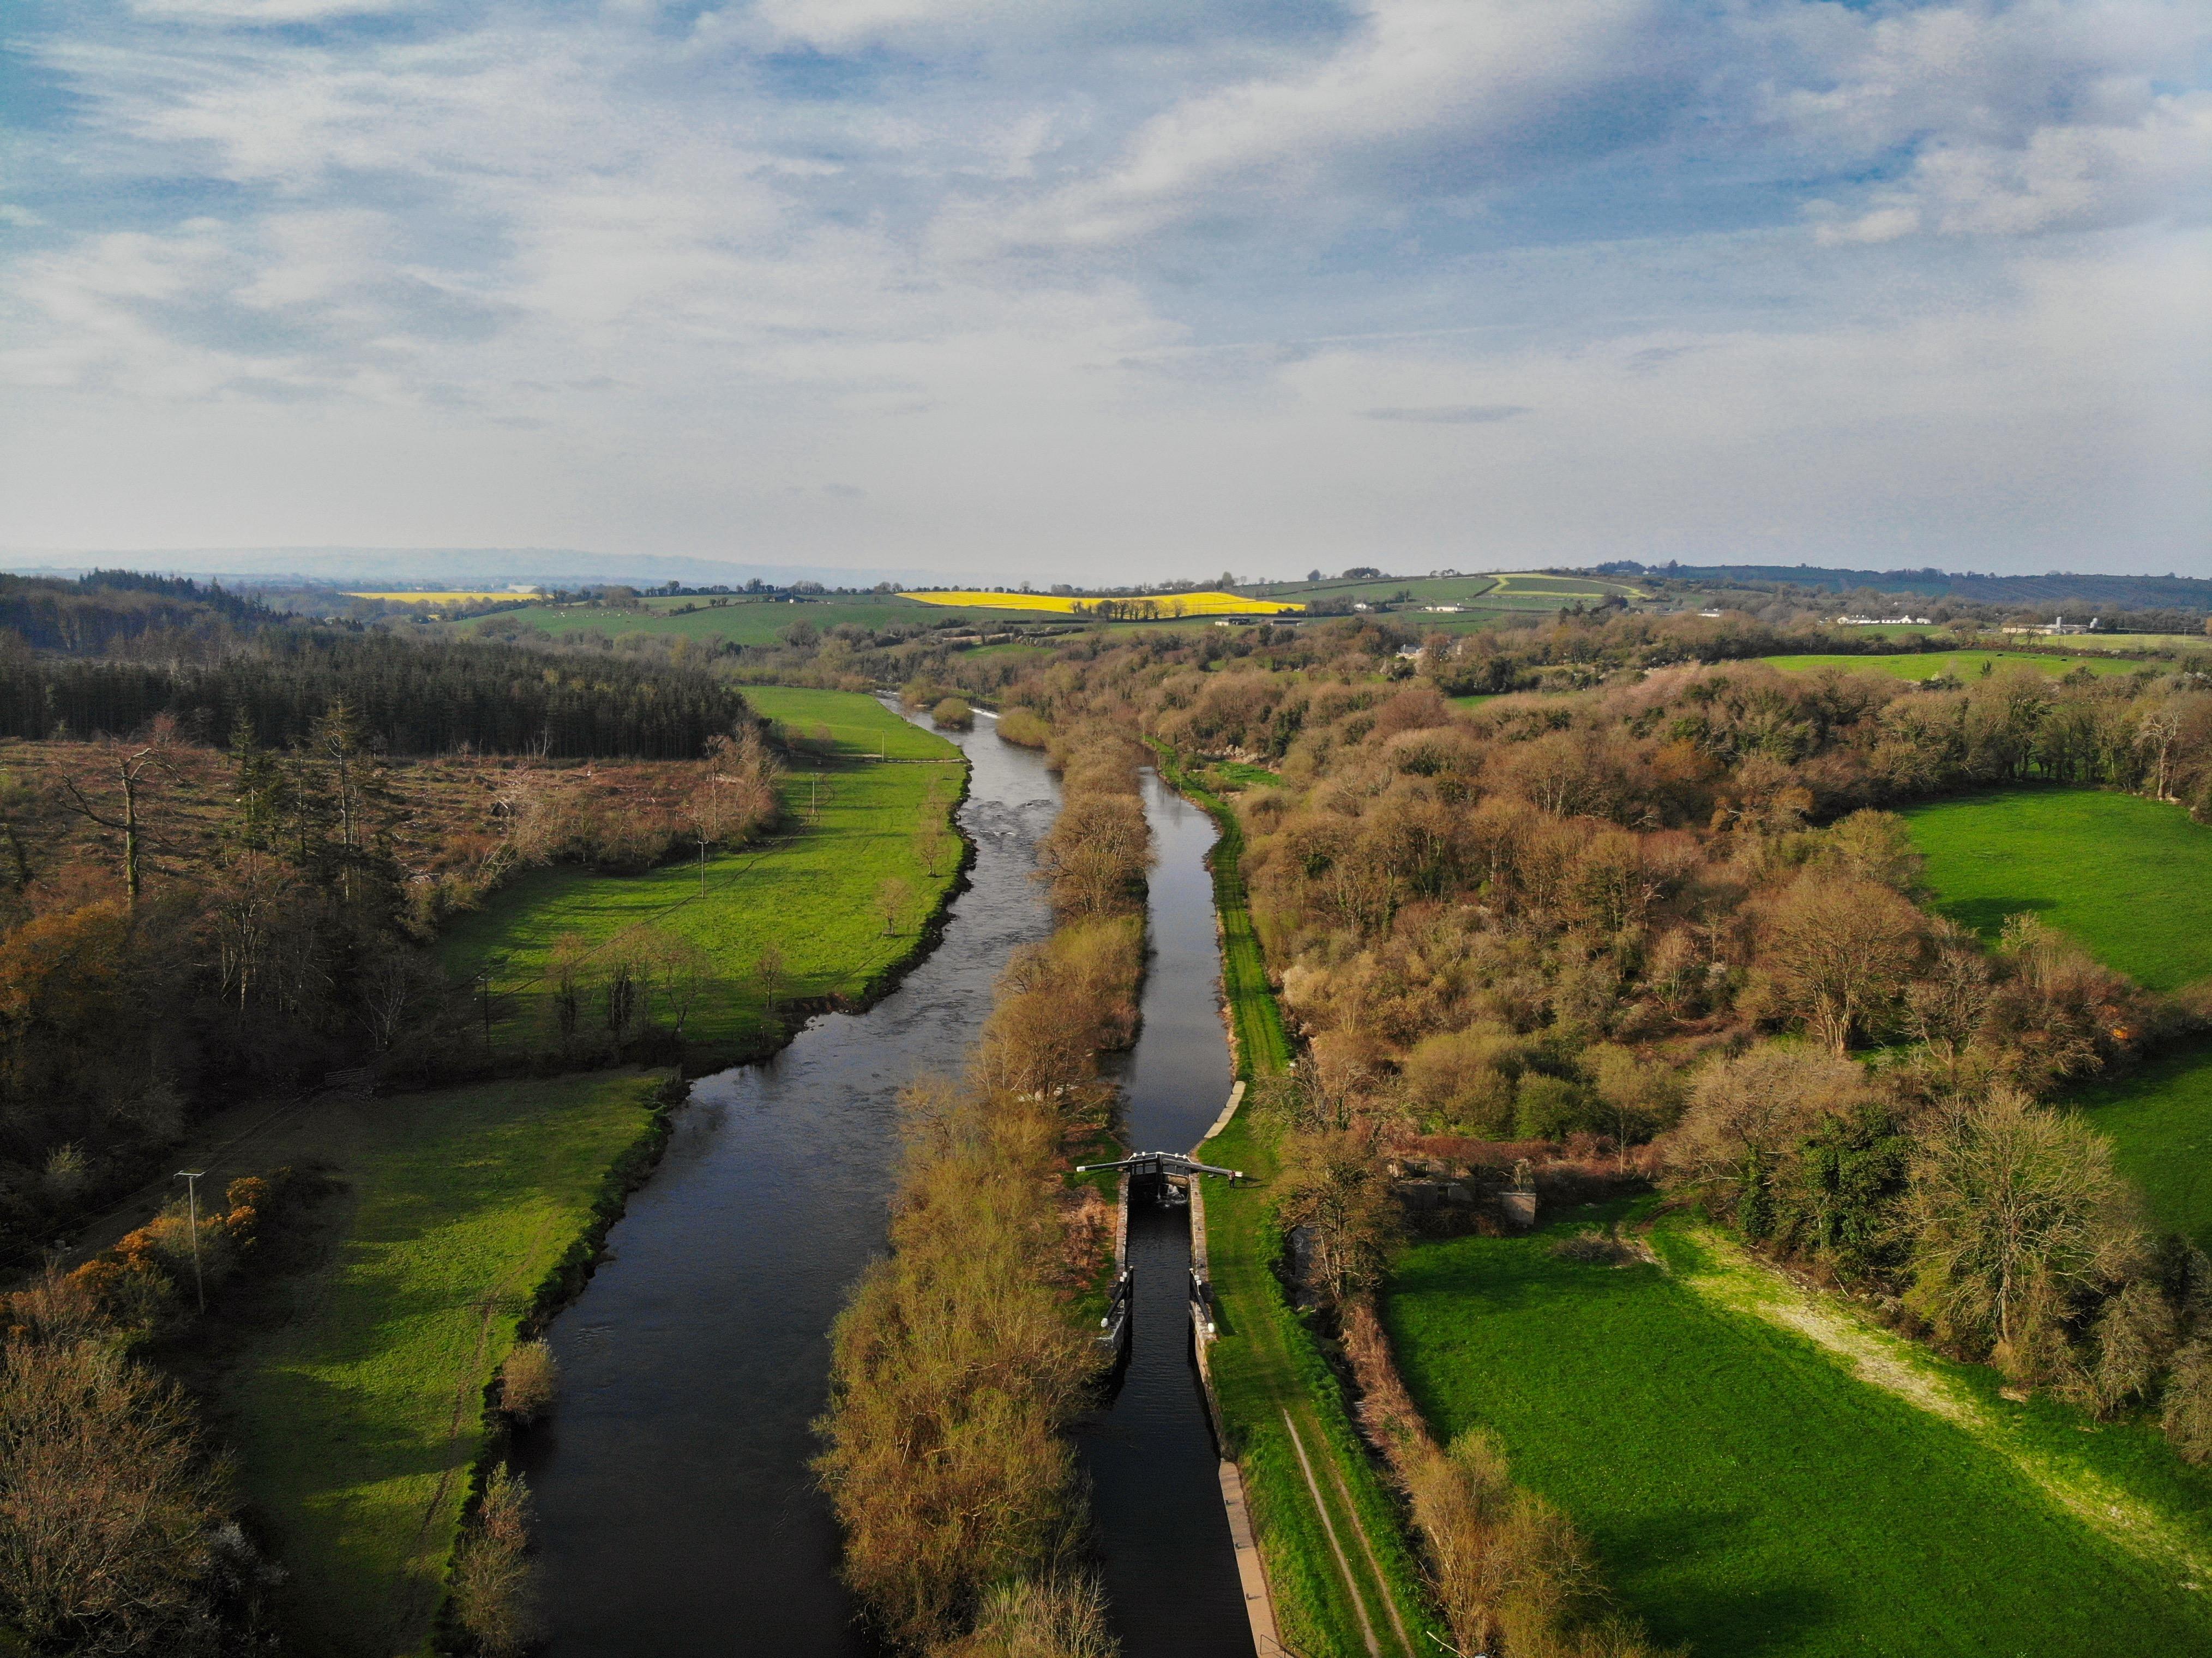 Ballytiglea Lock Gates and the River Barrow